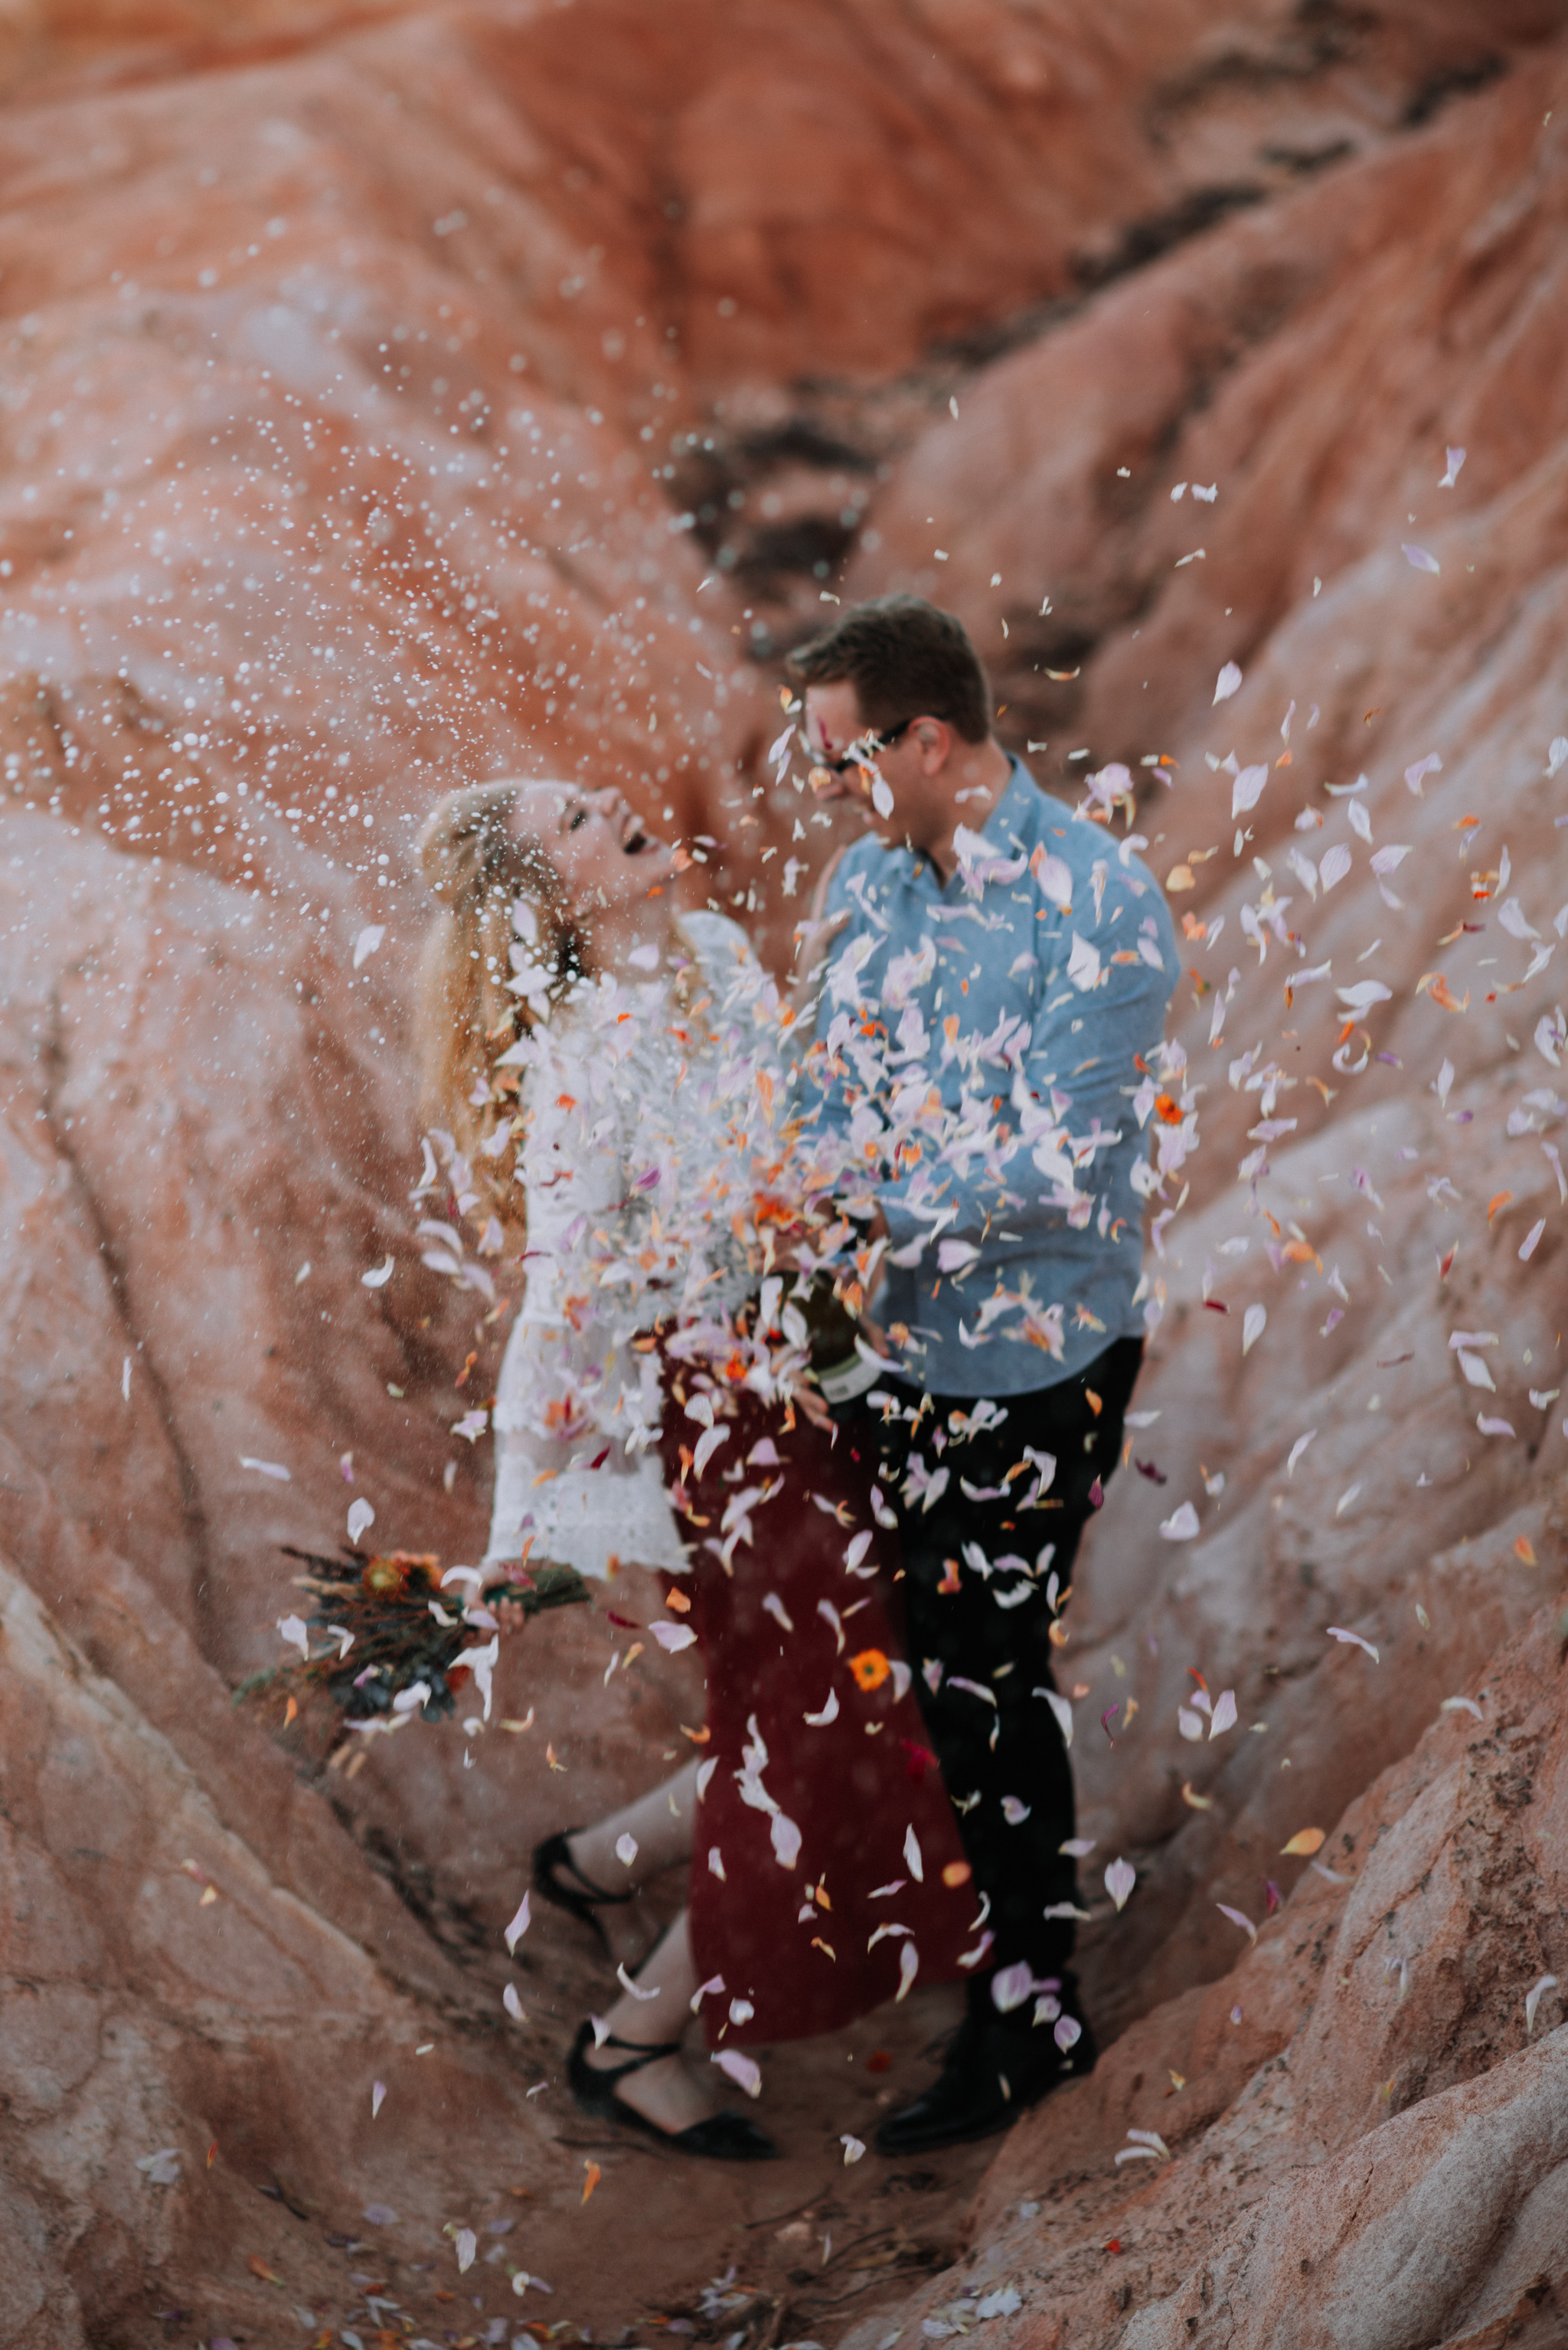 LOVELENSCAPES PHOTOGRAPHY • VISUAL POETRY • MELBOURNE WEDDING PHOTOGRAPHER • ALANNAH HILL DRESS • SUNSET ENGAGEMENT PHOTOS • PINK CLIFFS HEATHCOTE • FASHION EDITORIAL PHOTOGRAPHER • 8.jpg